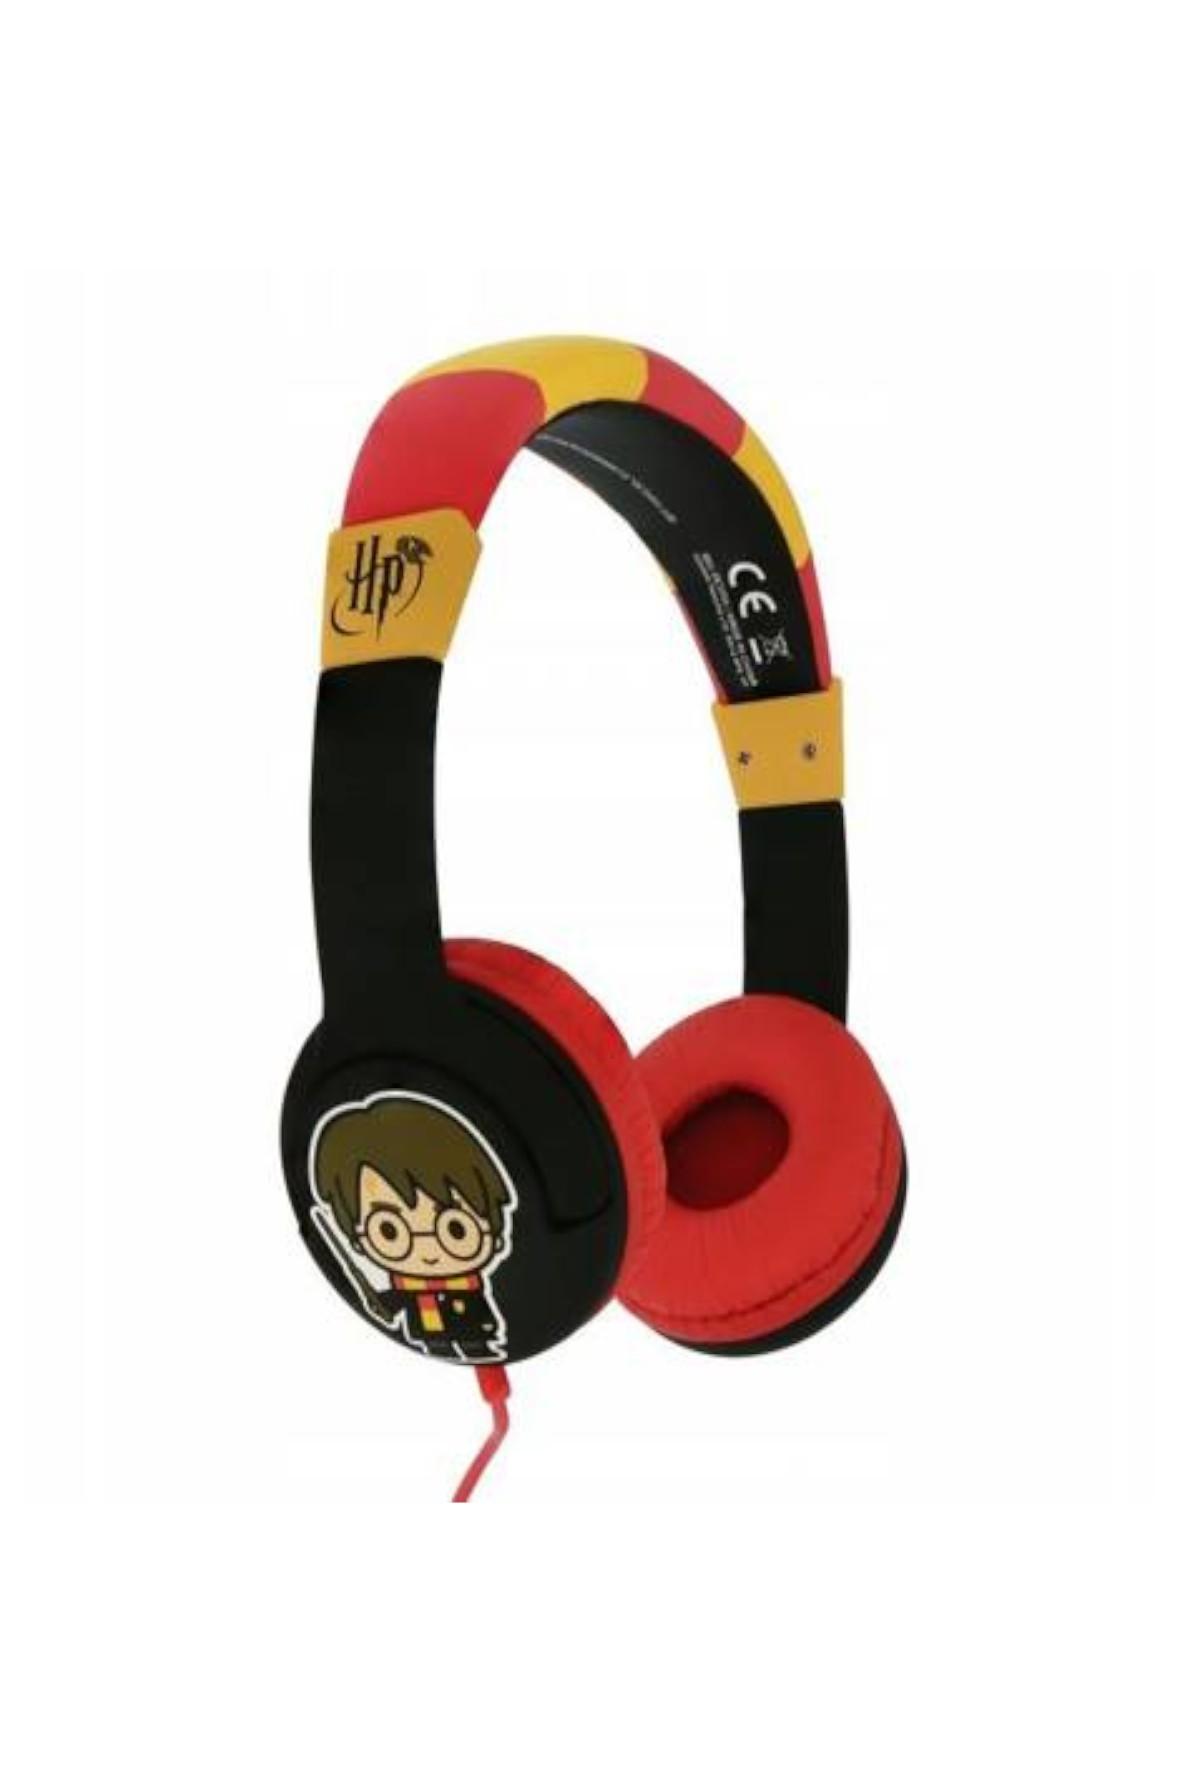 Słuchawki  OTL nauszne Harry Potter wiek 3-7lat